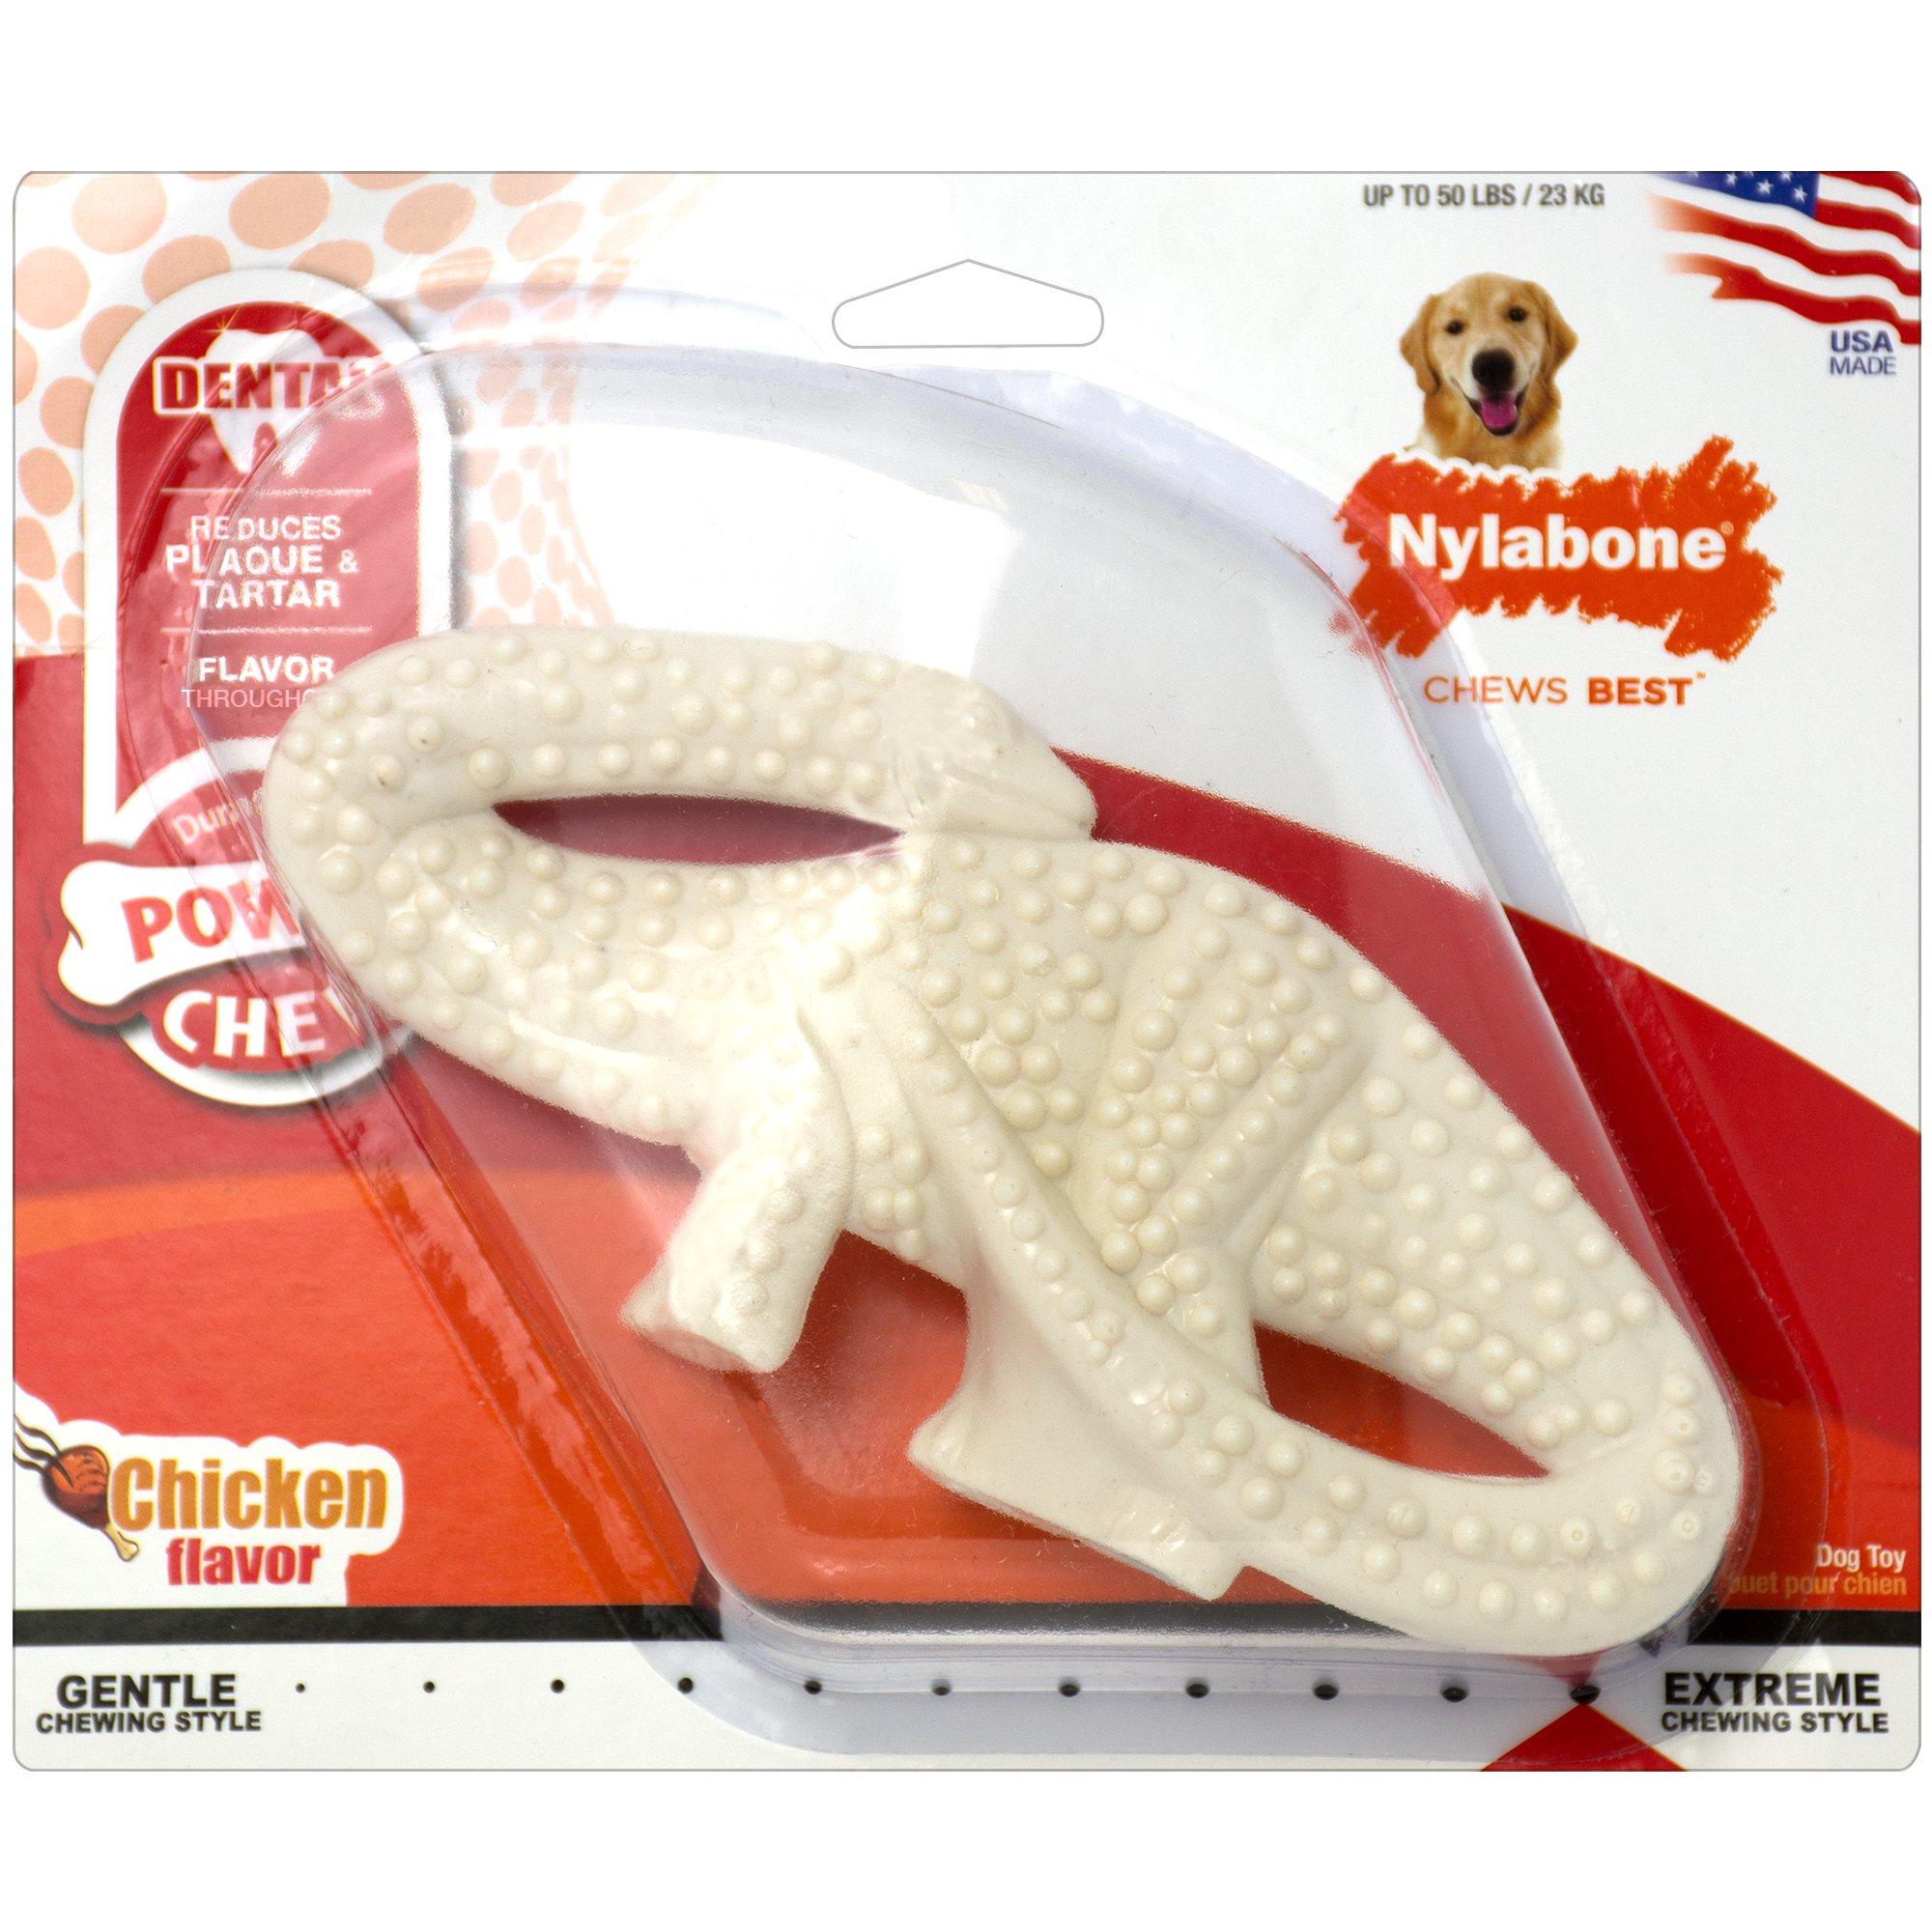 Nylabone Dental Dinosaur Chew, Small